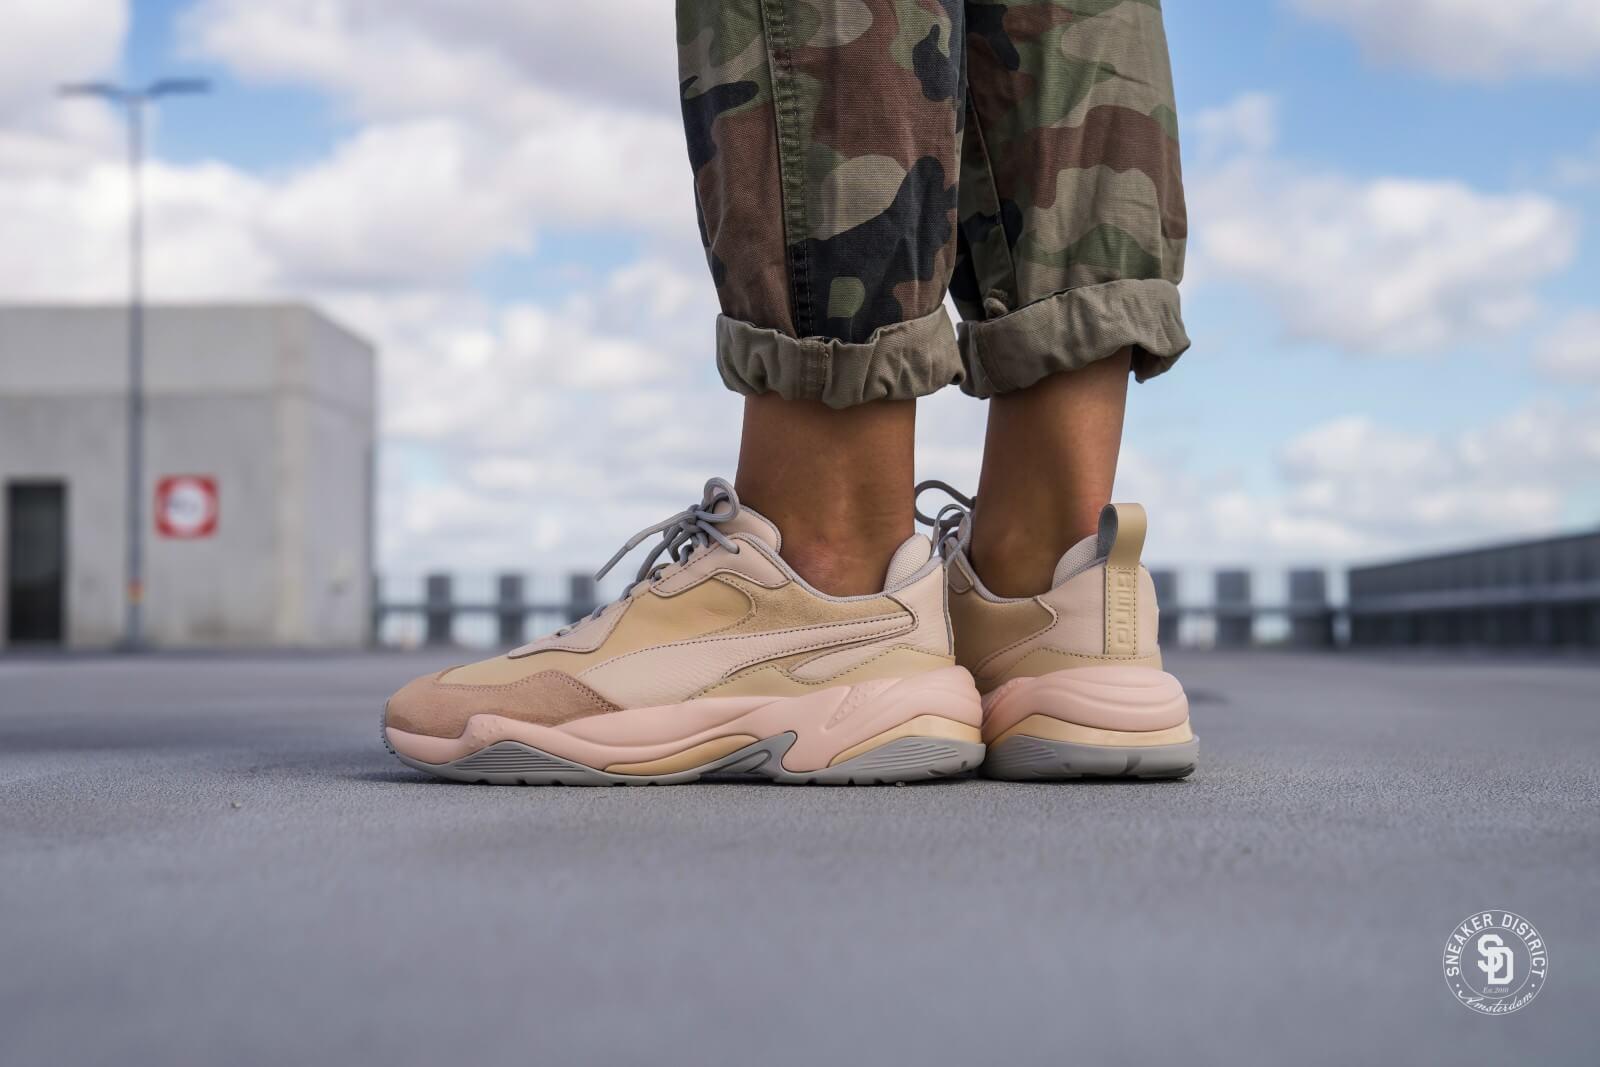 Thunder Desert Women's Sneakers   Natural Vachetta Cream Tan